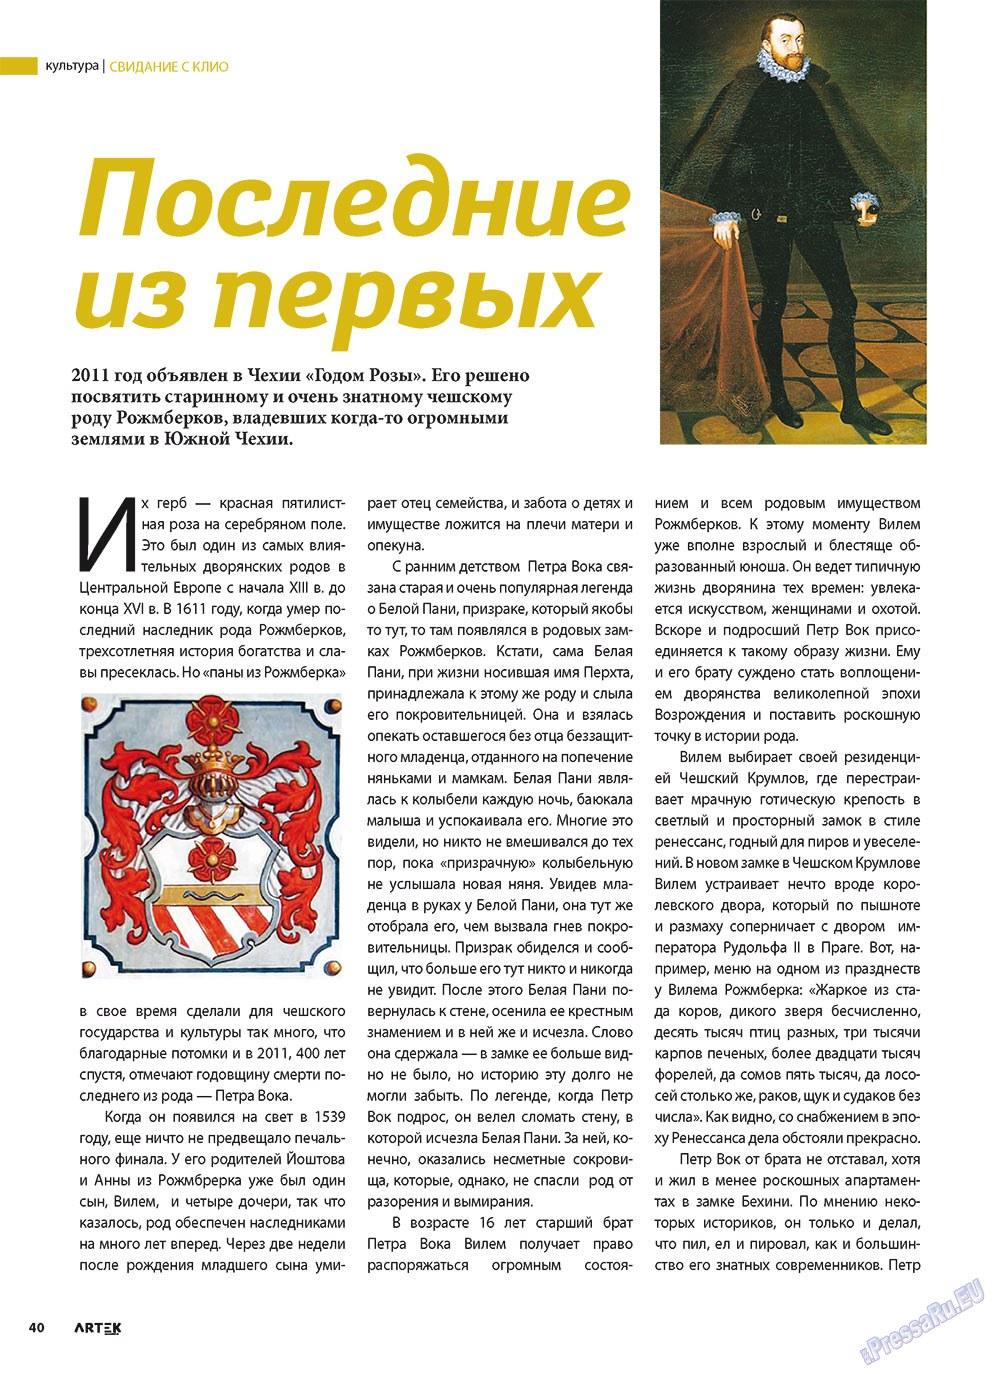 Артек (журнал). 2011 год, номер 1, стр. 42